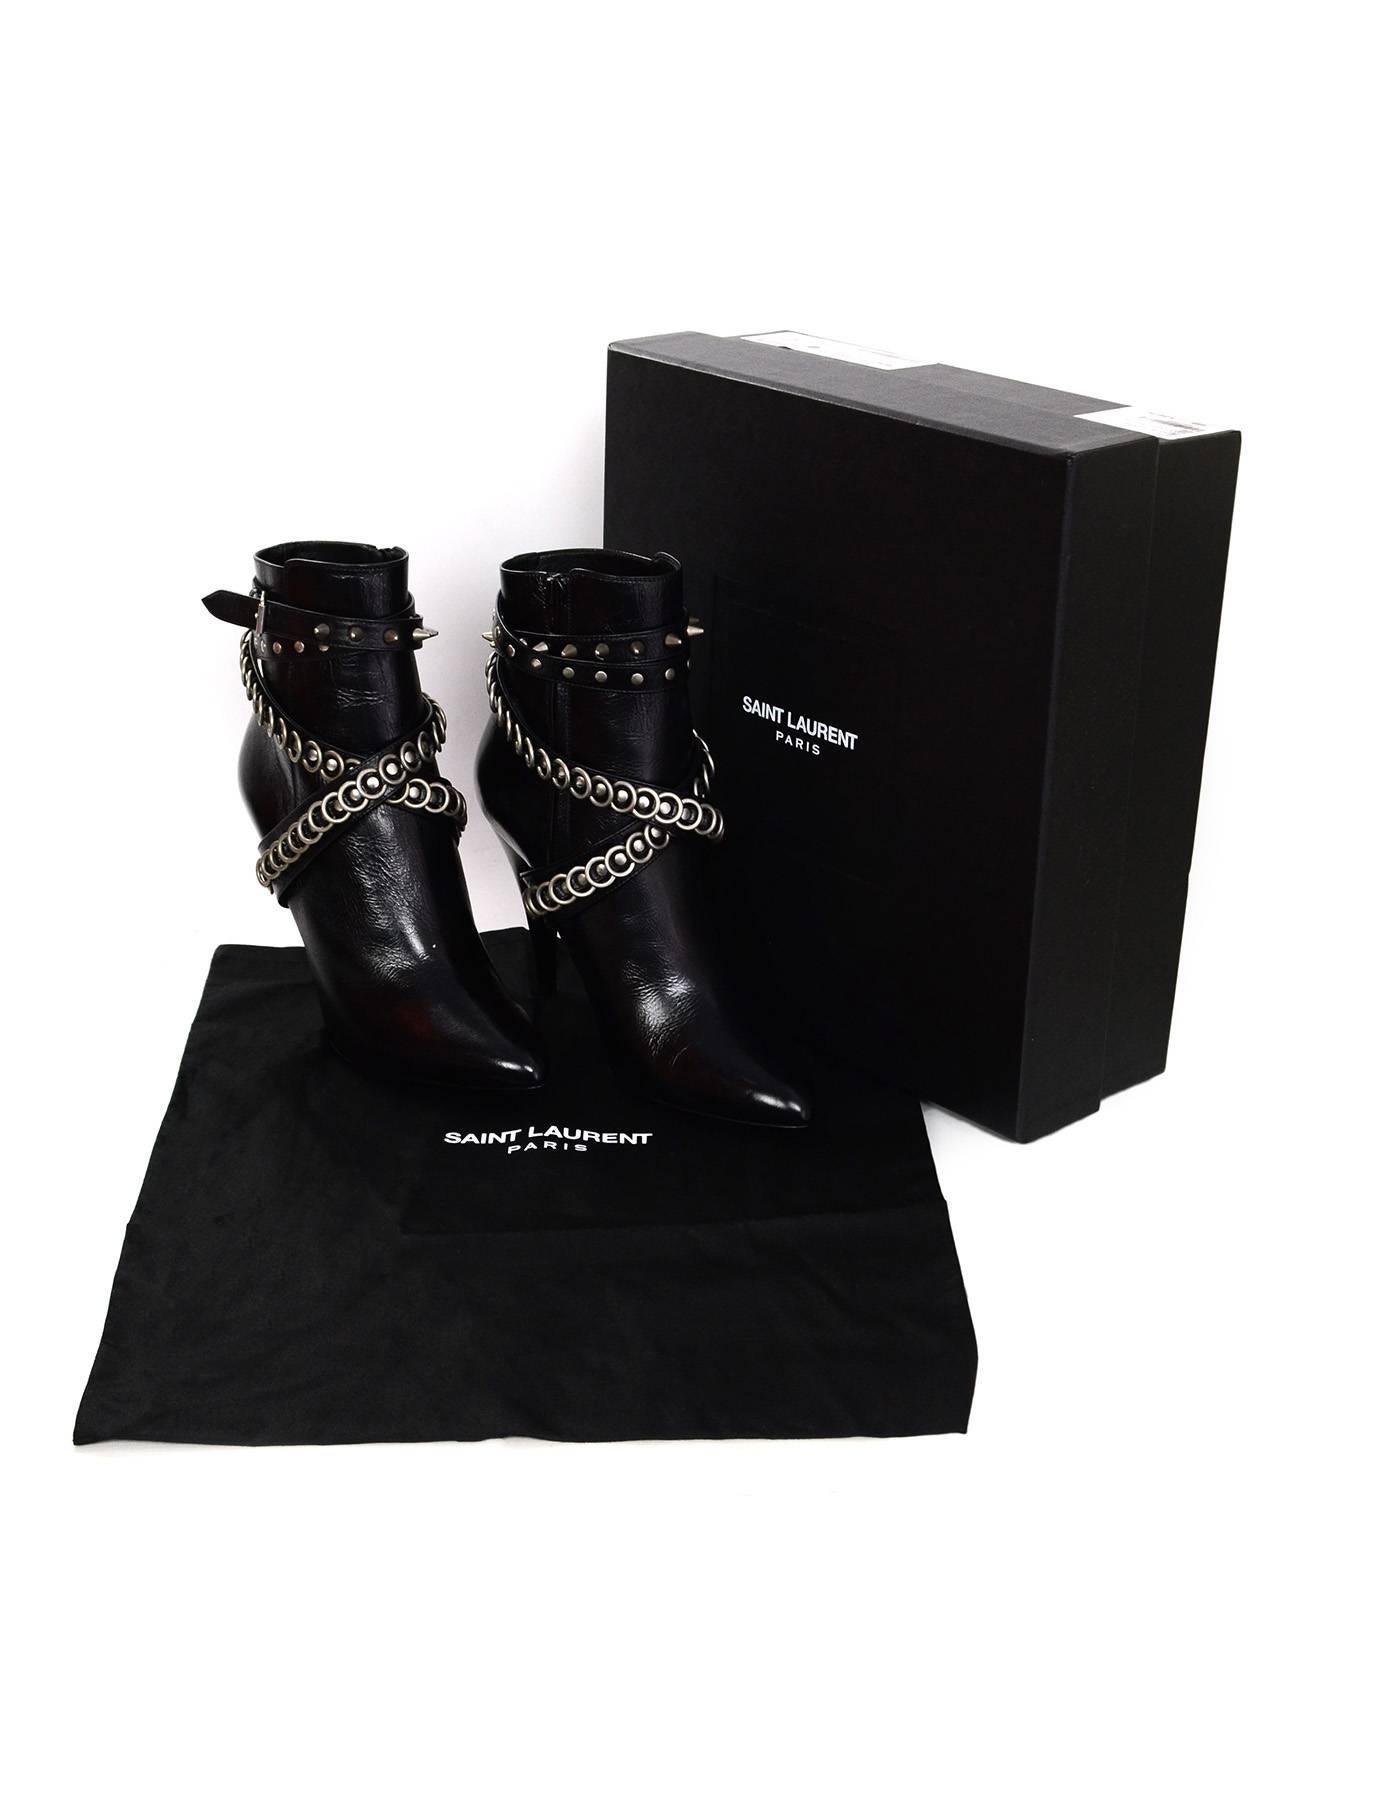 68e8cc12dbc Saint Laurent Black Leather Multi-trap Studded Fetish 105 Booties sz 39 For  Sale at 1stdibs